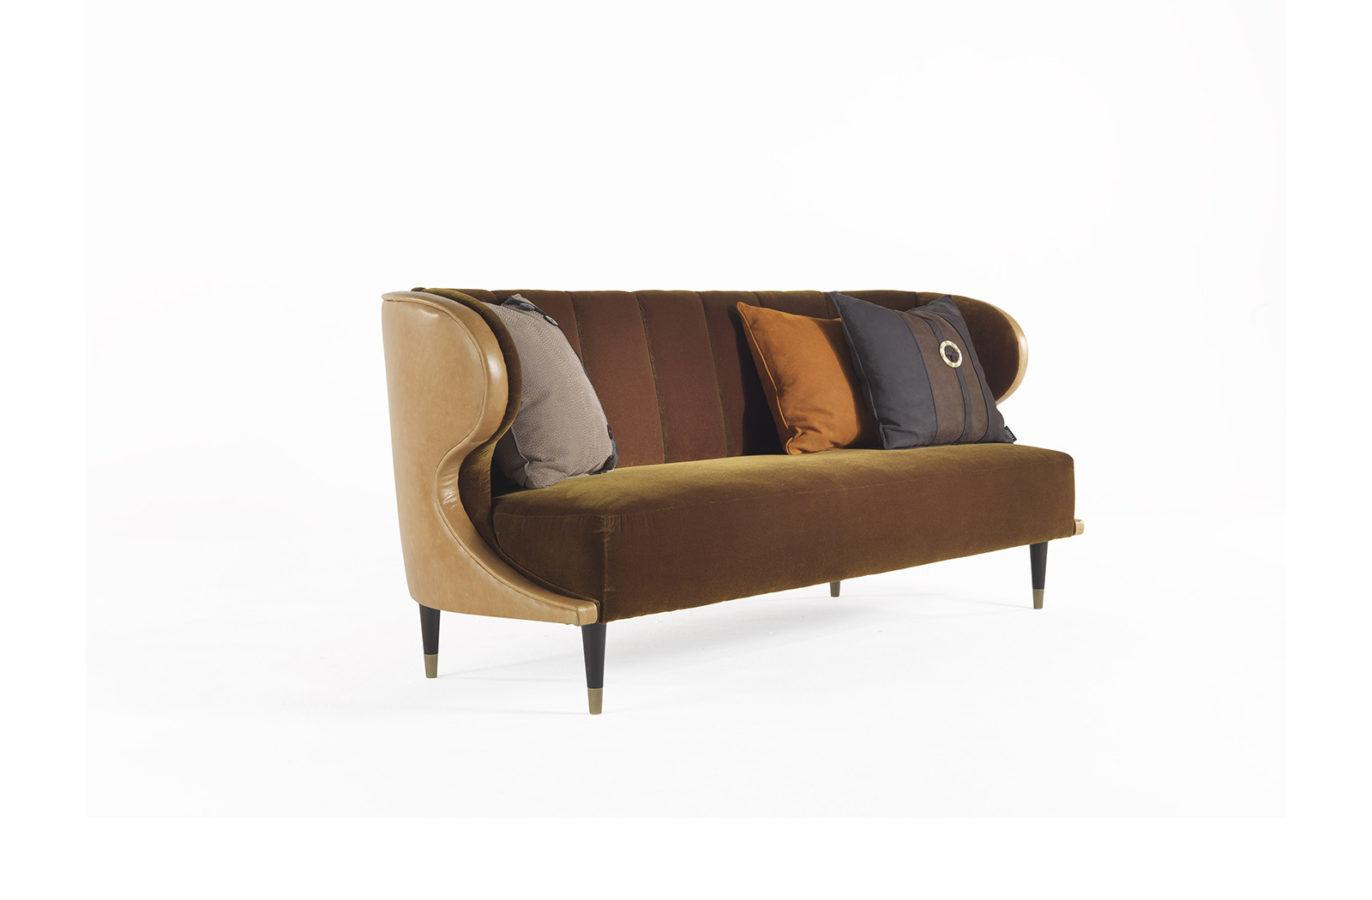 Dunlop 2 Seater Sofa 1